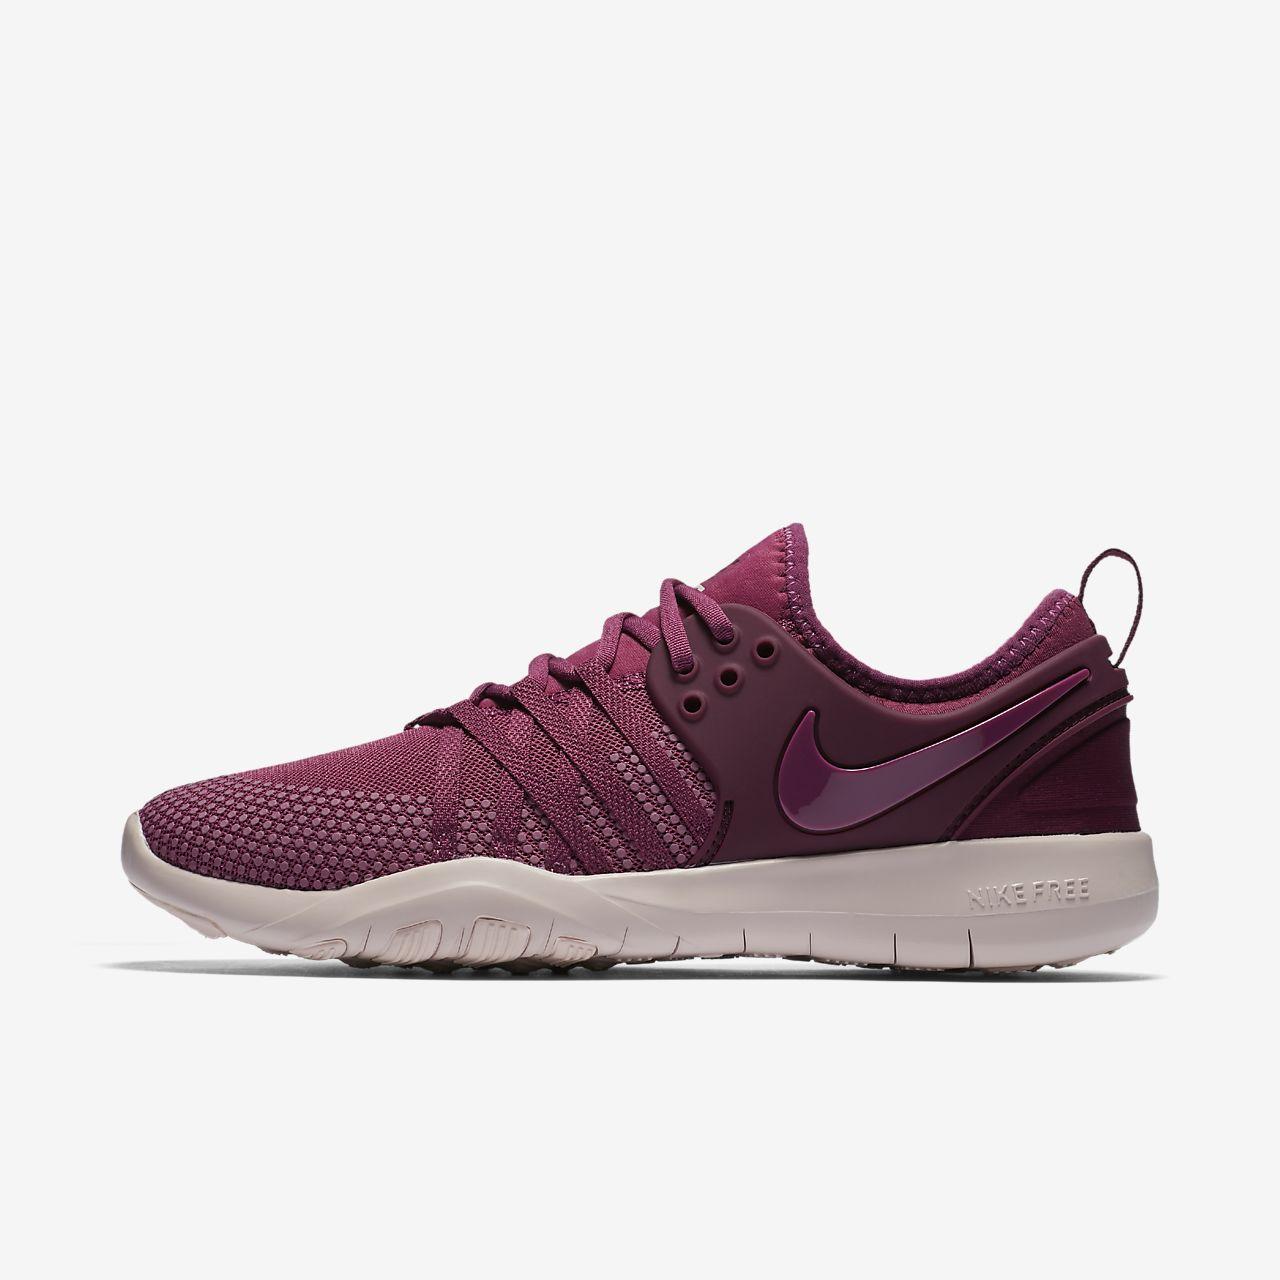 d37c54d9d0ec0 Nike Free TR 7 Women s Training Shoe. Nike.com BE